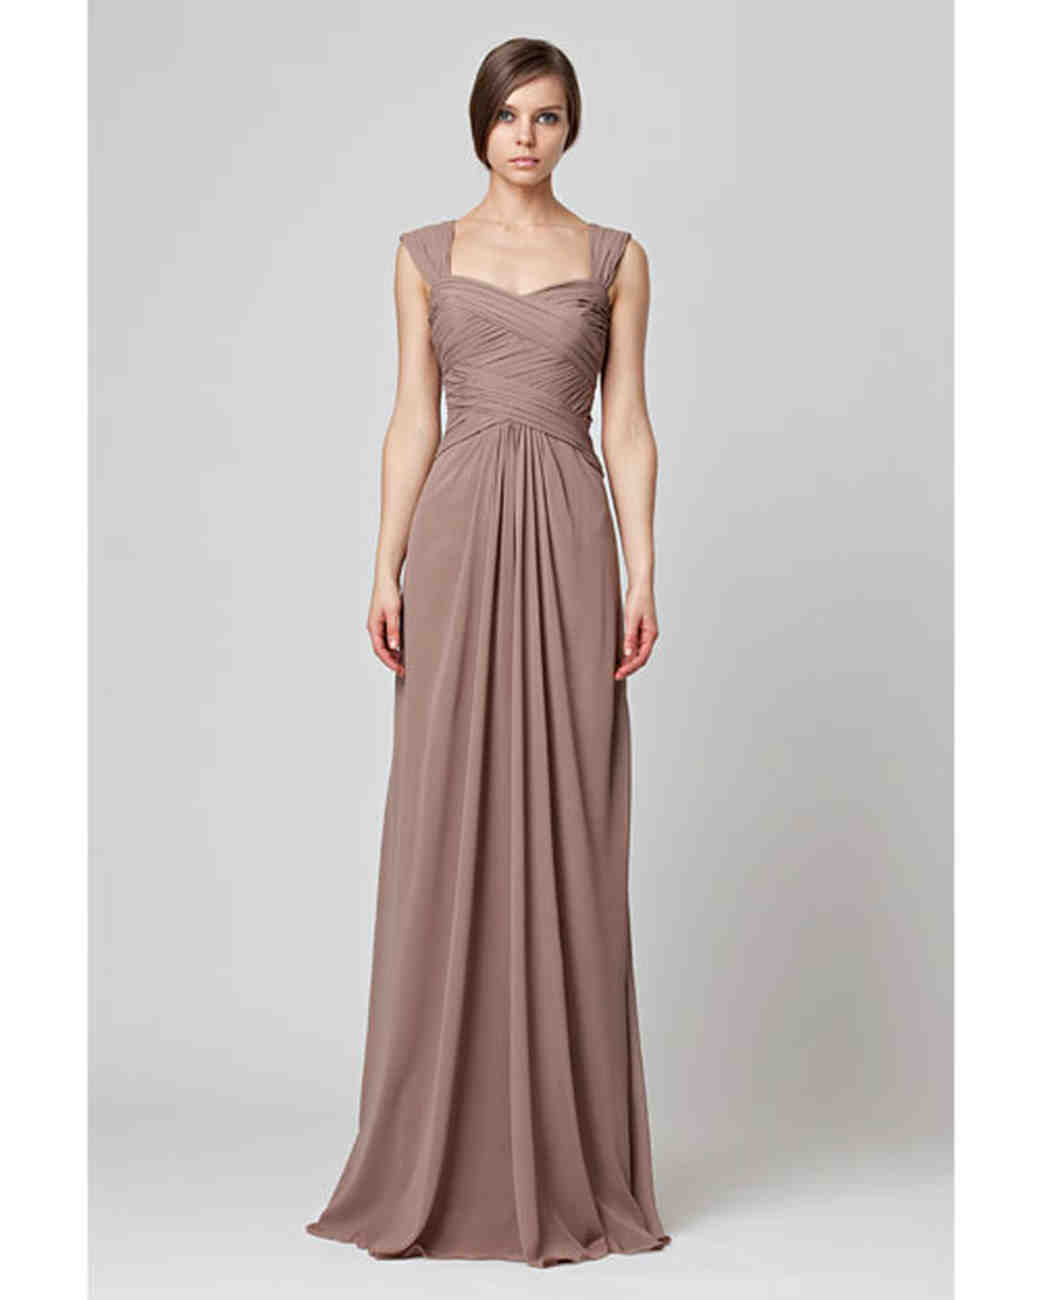 Brown Bridesmaid Dresses | Martha Stewart Weddings